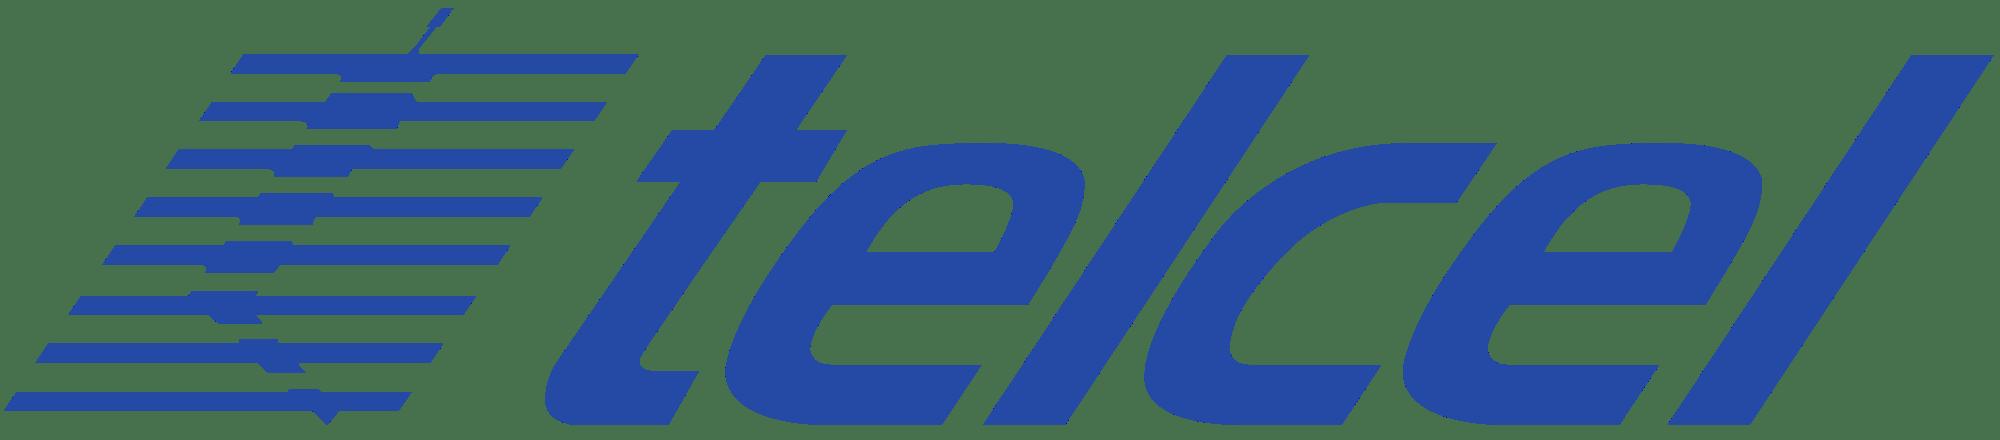 Telcel Pay logo